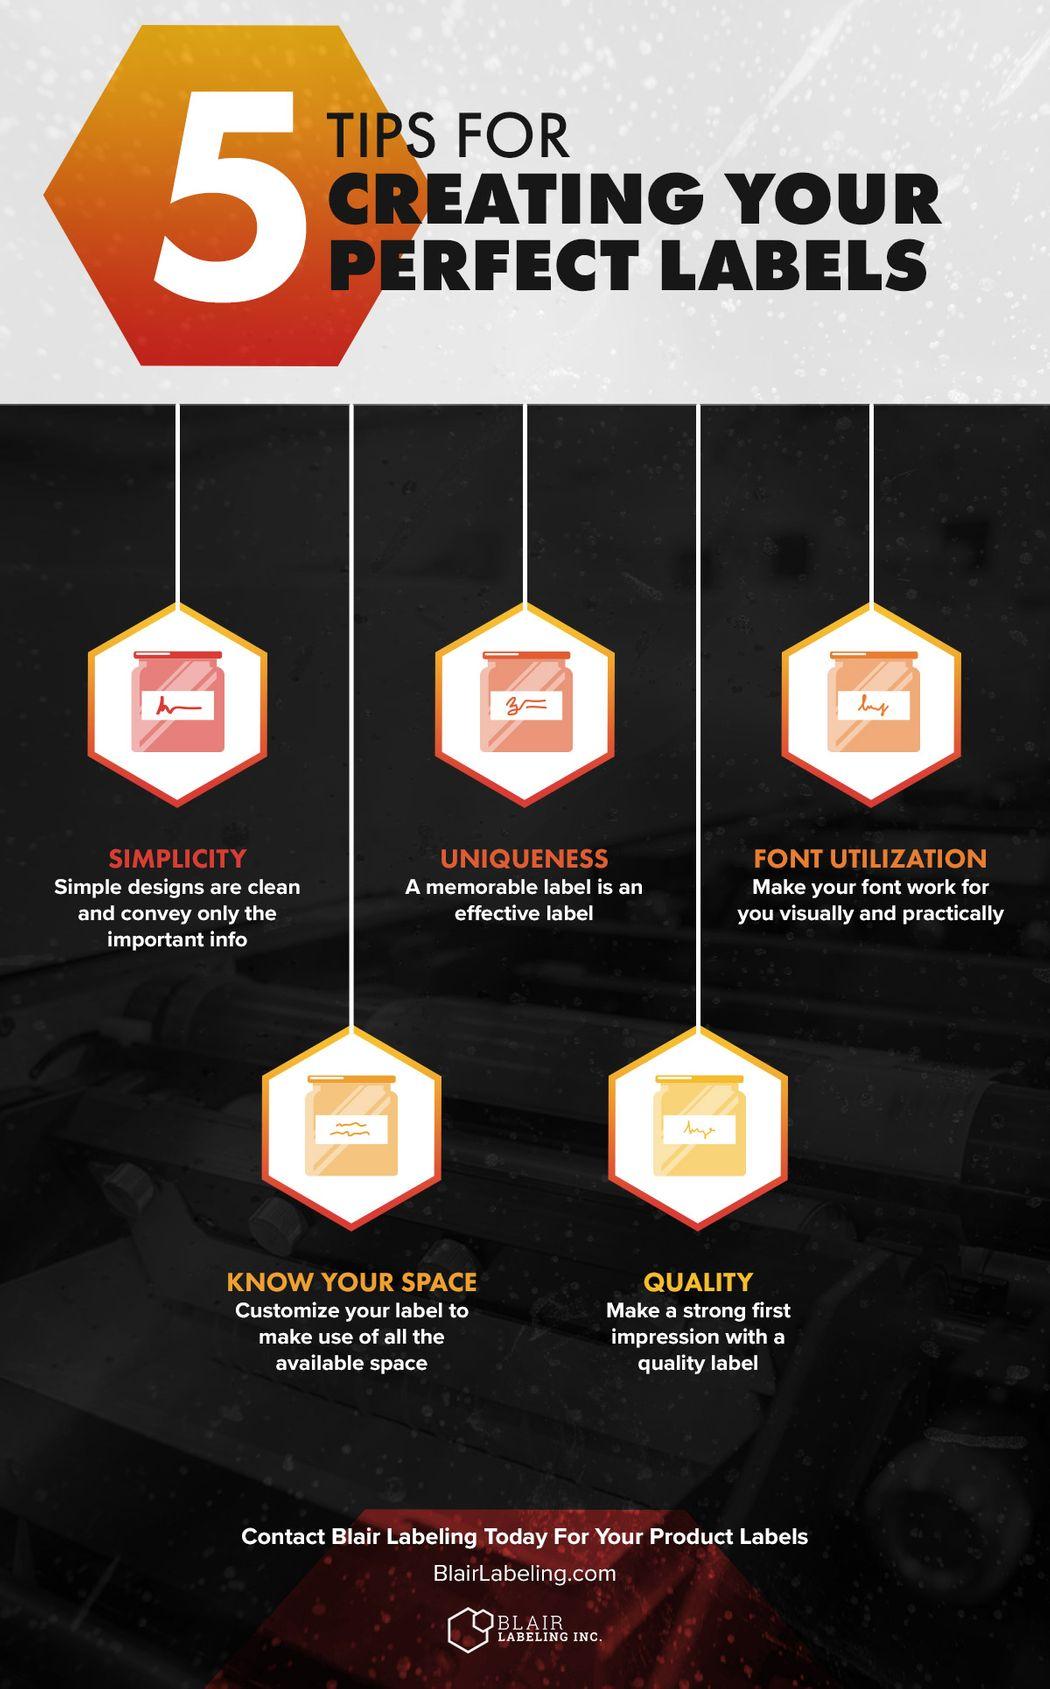 BlairLabeling_Infographic.jpg